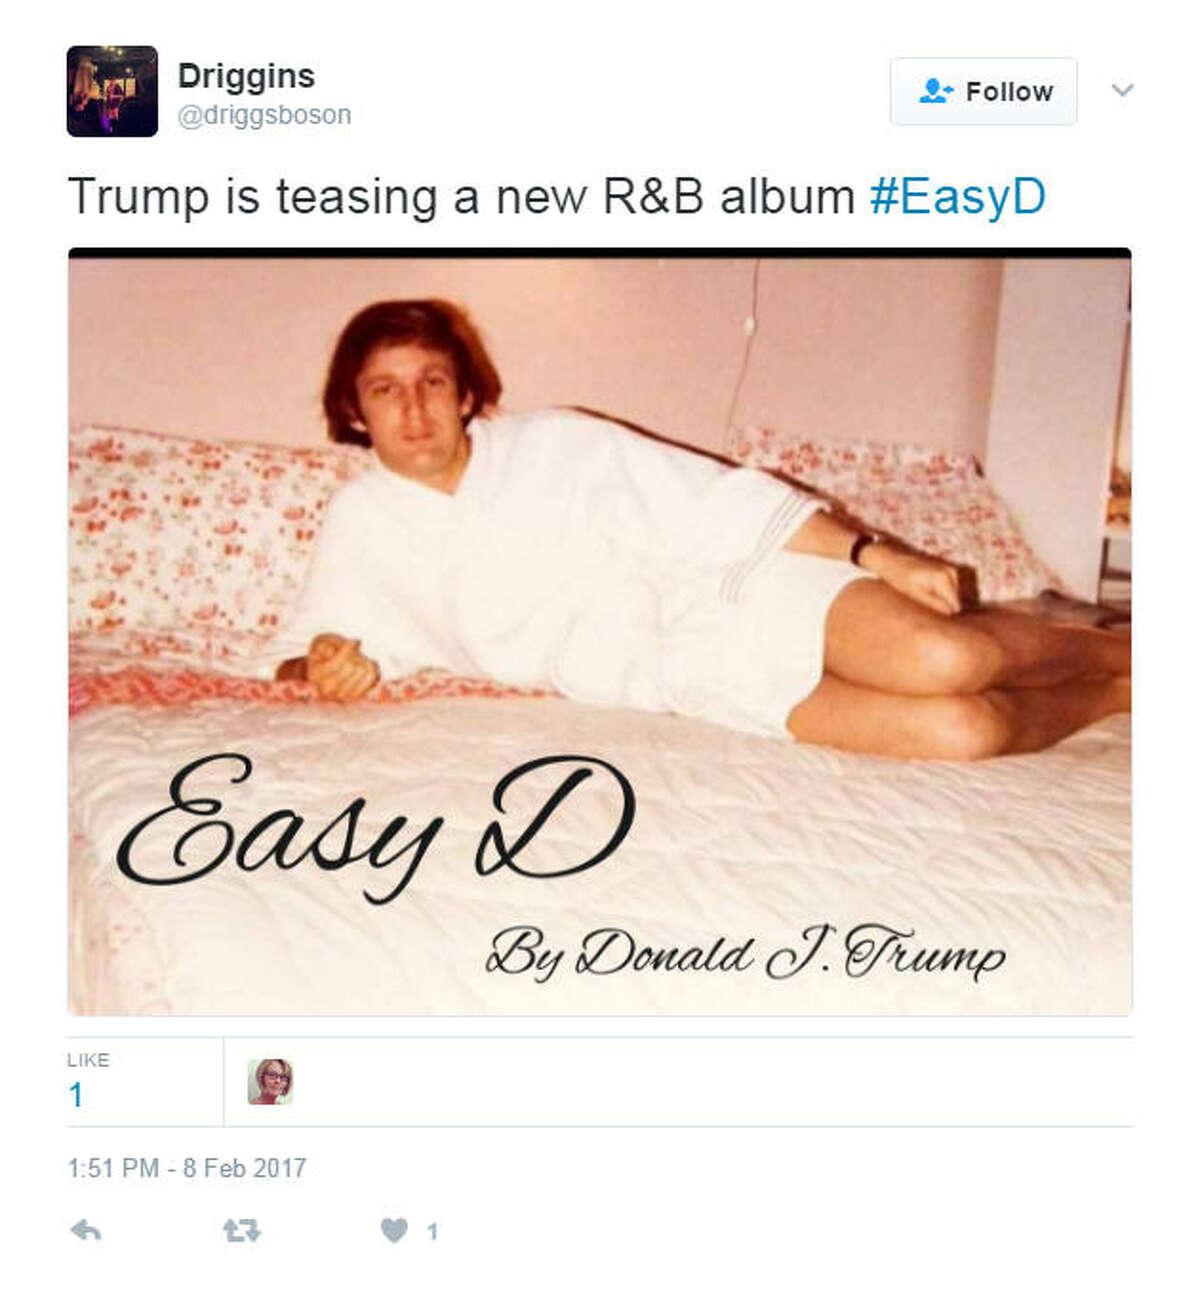 """Trump is teasing a new R&B album #EasyD"" Source: Twitter"